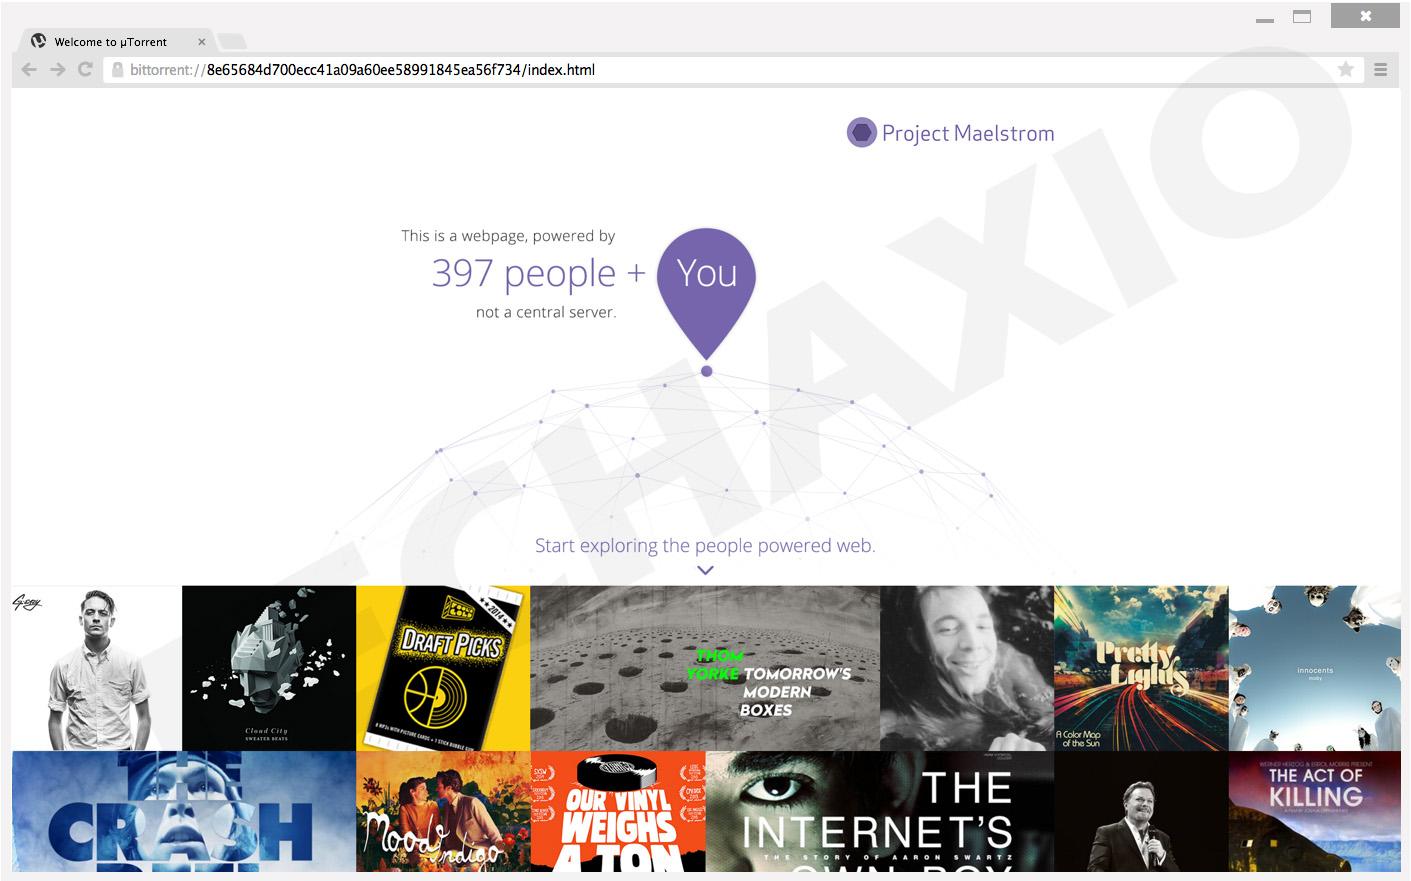 Project Maelstrom Screenshot